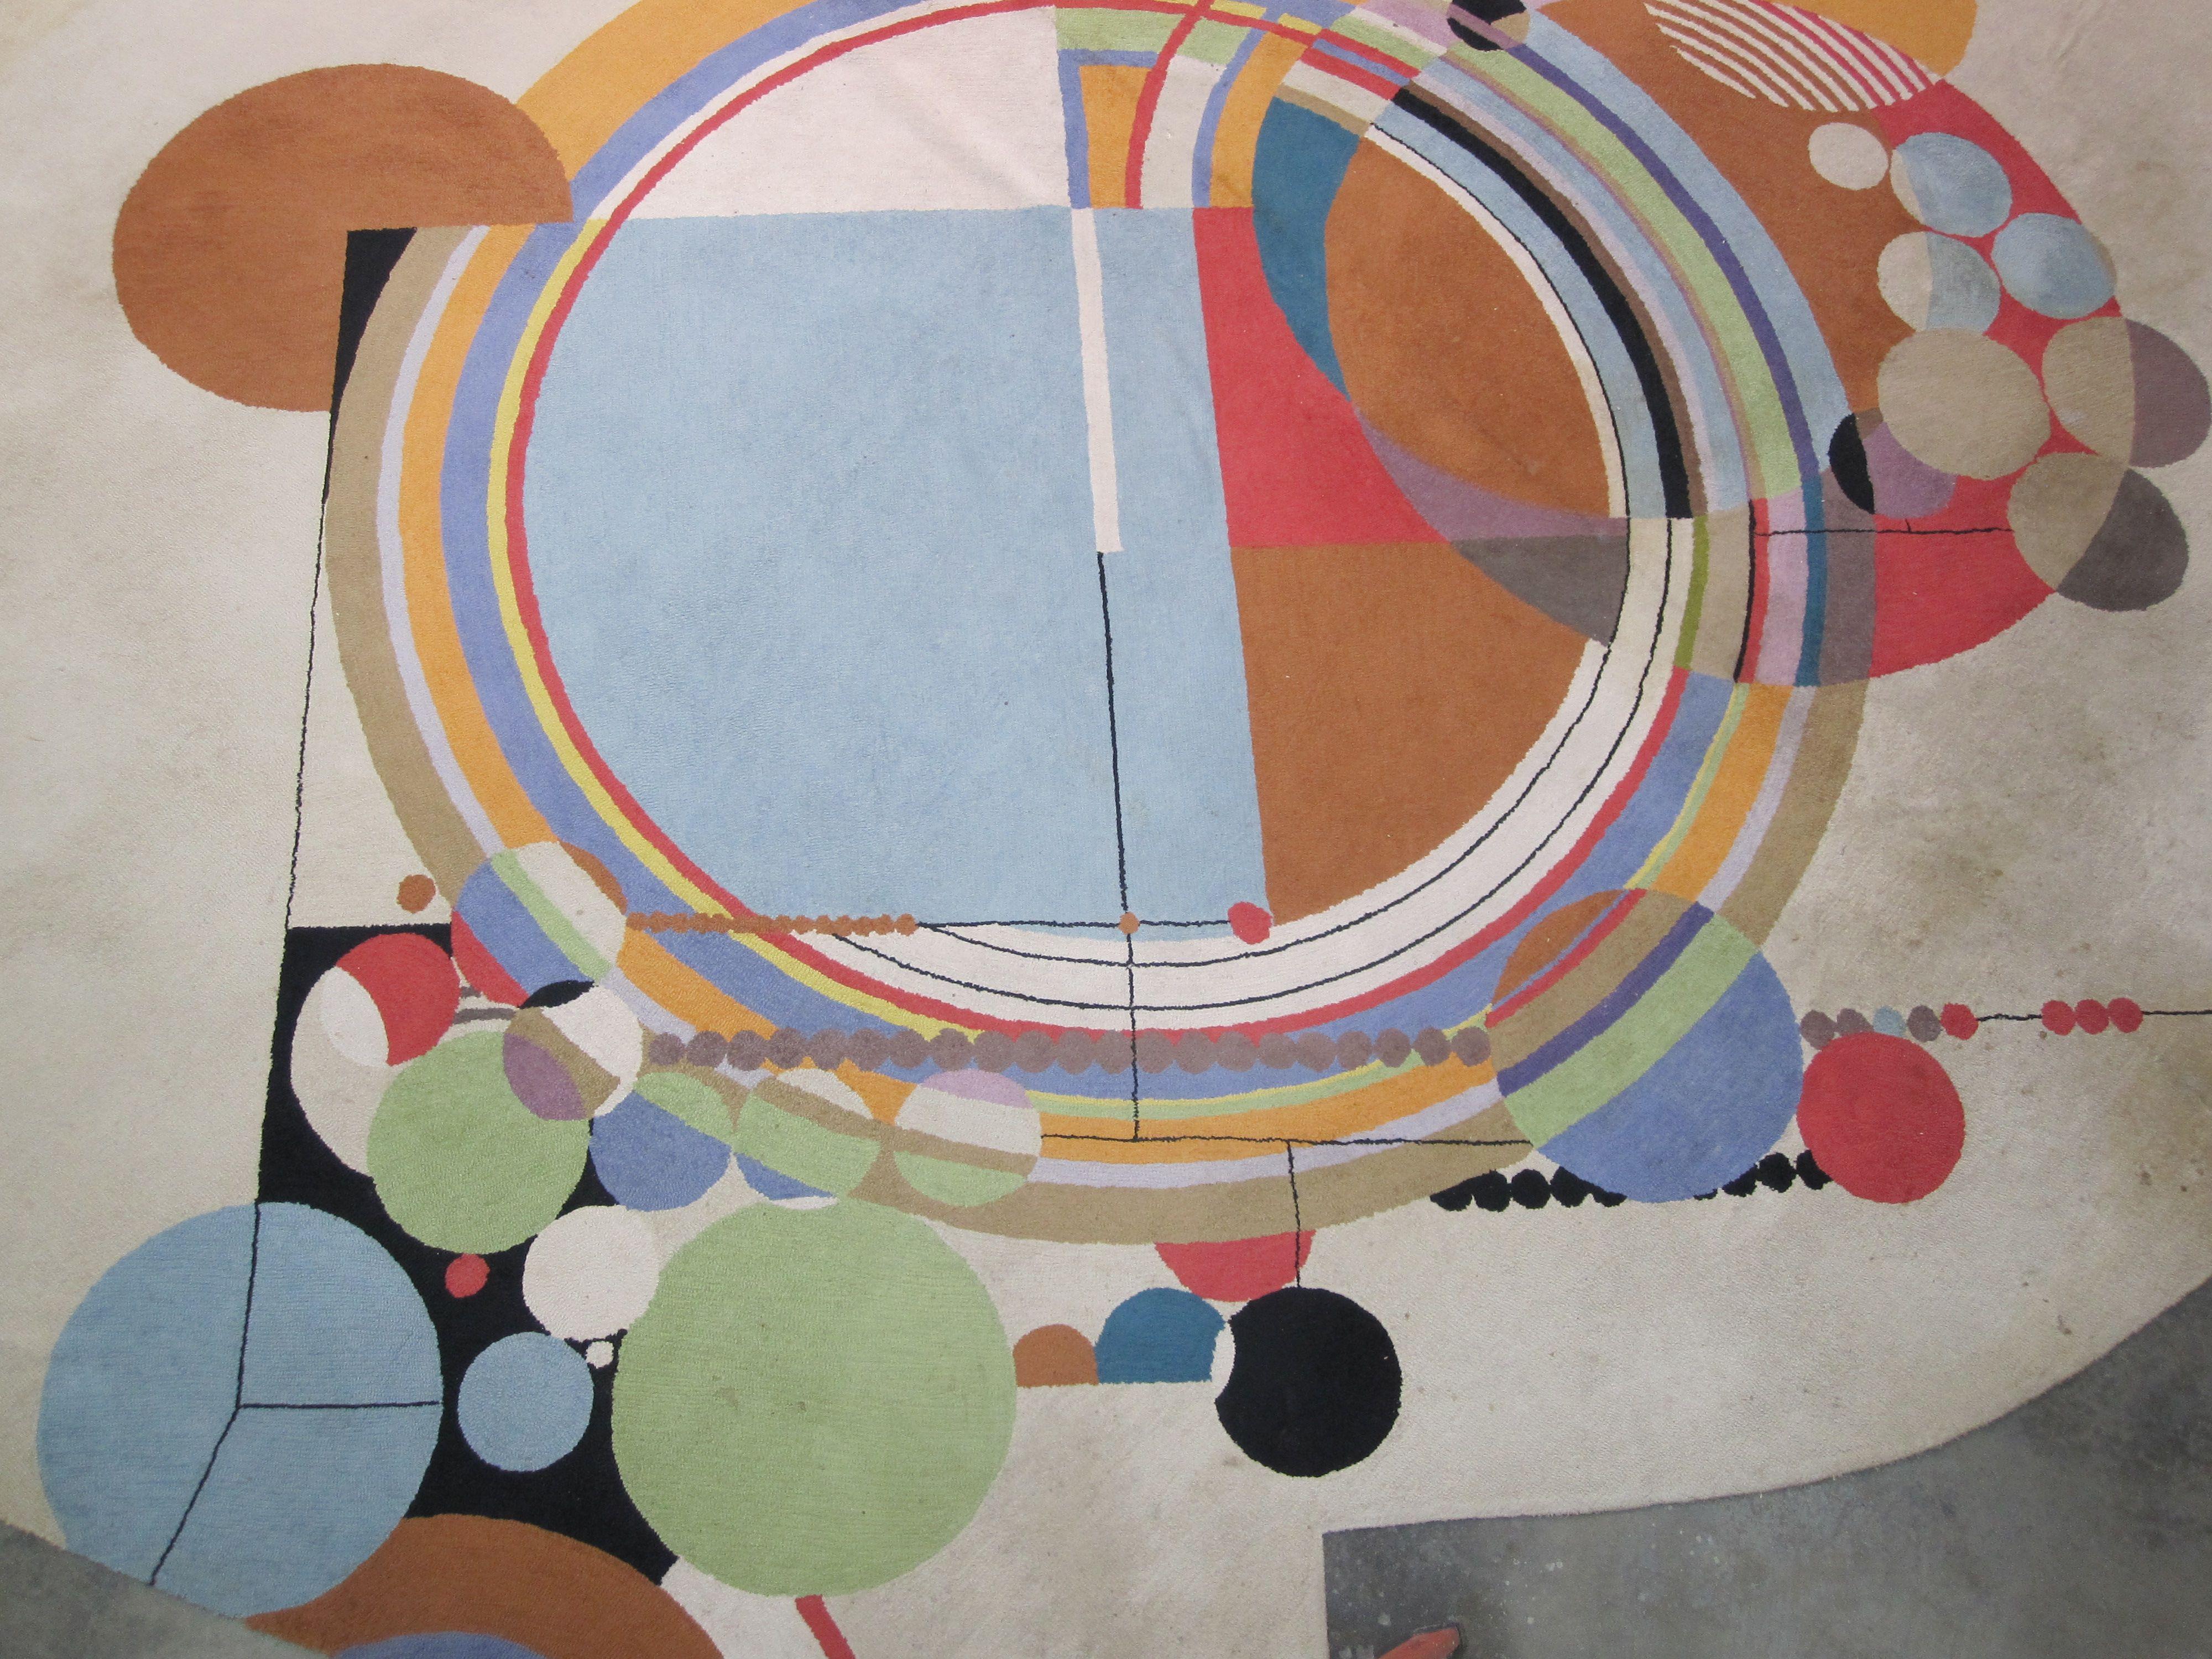 Frank Lloyd Wright Rug Revealed With